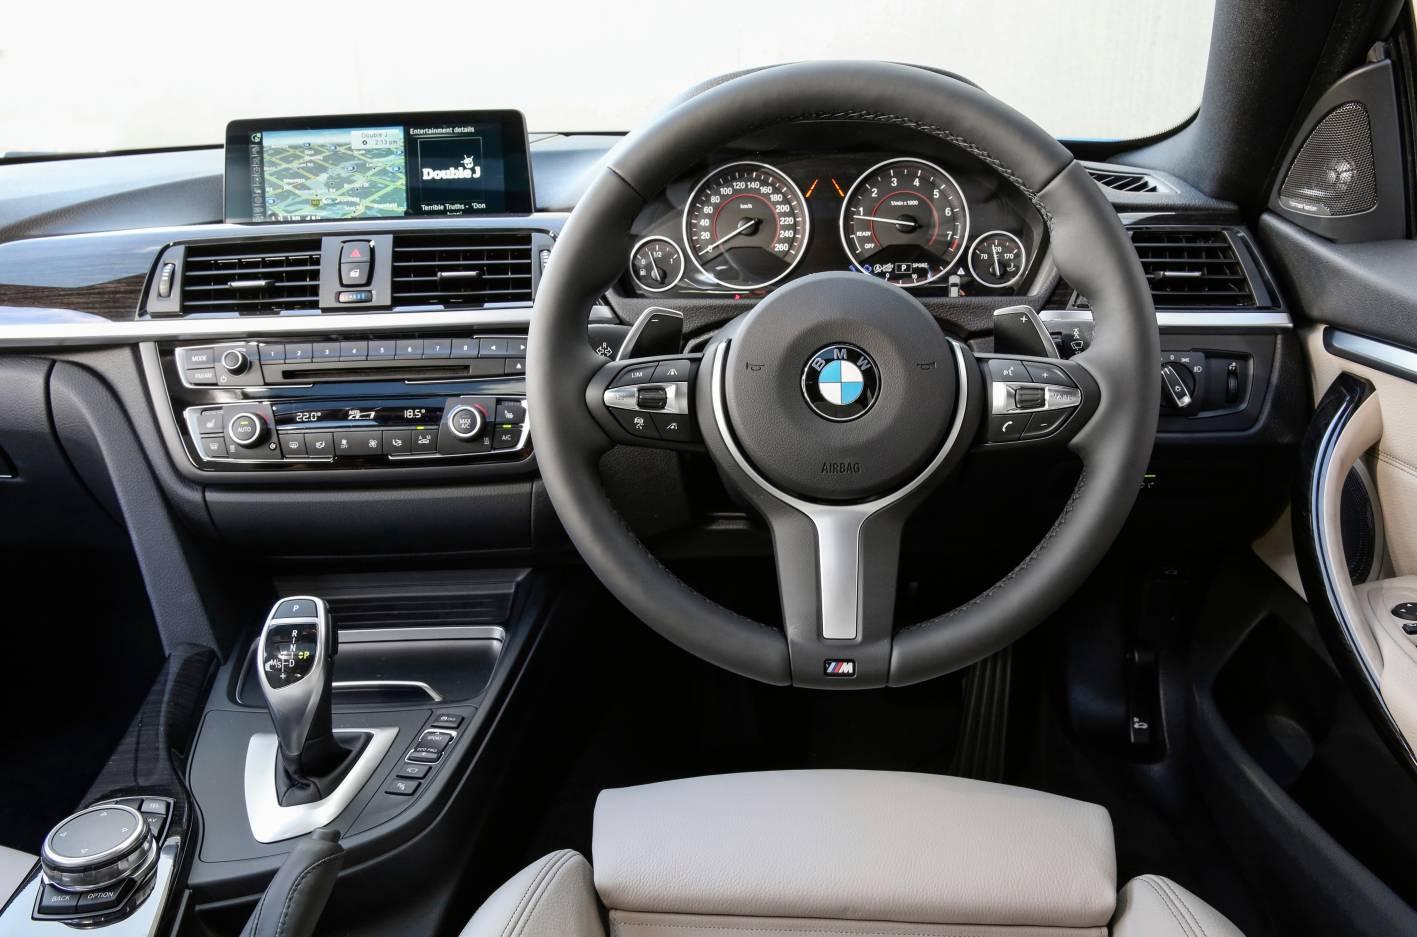 BMW News: BMW revitalises 4 Series range for 2016. Now cheaper